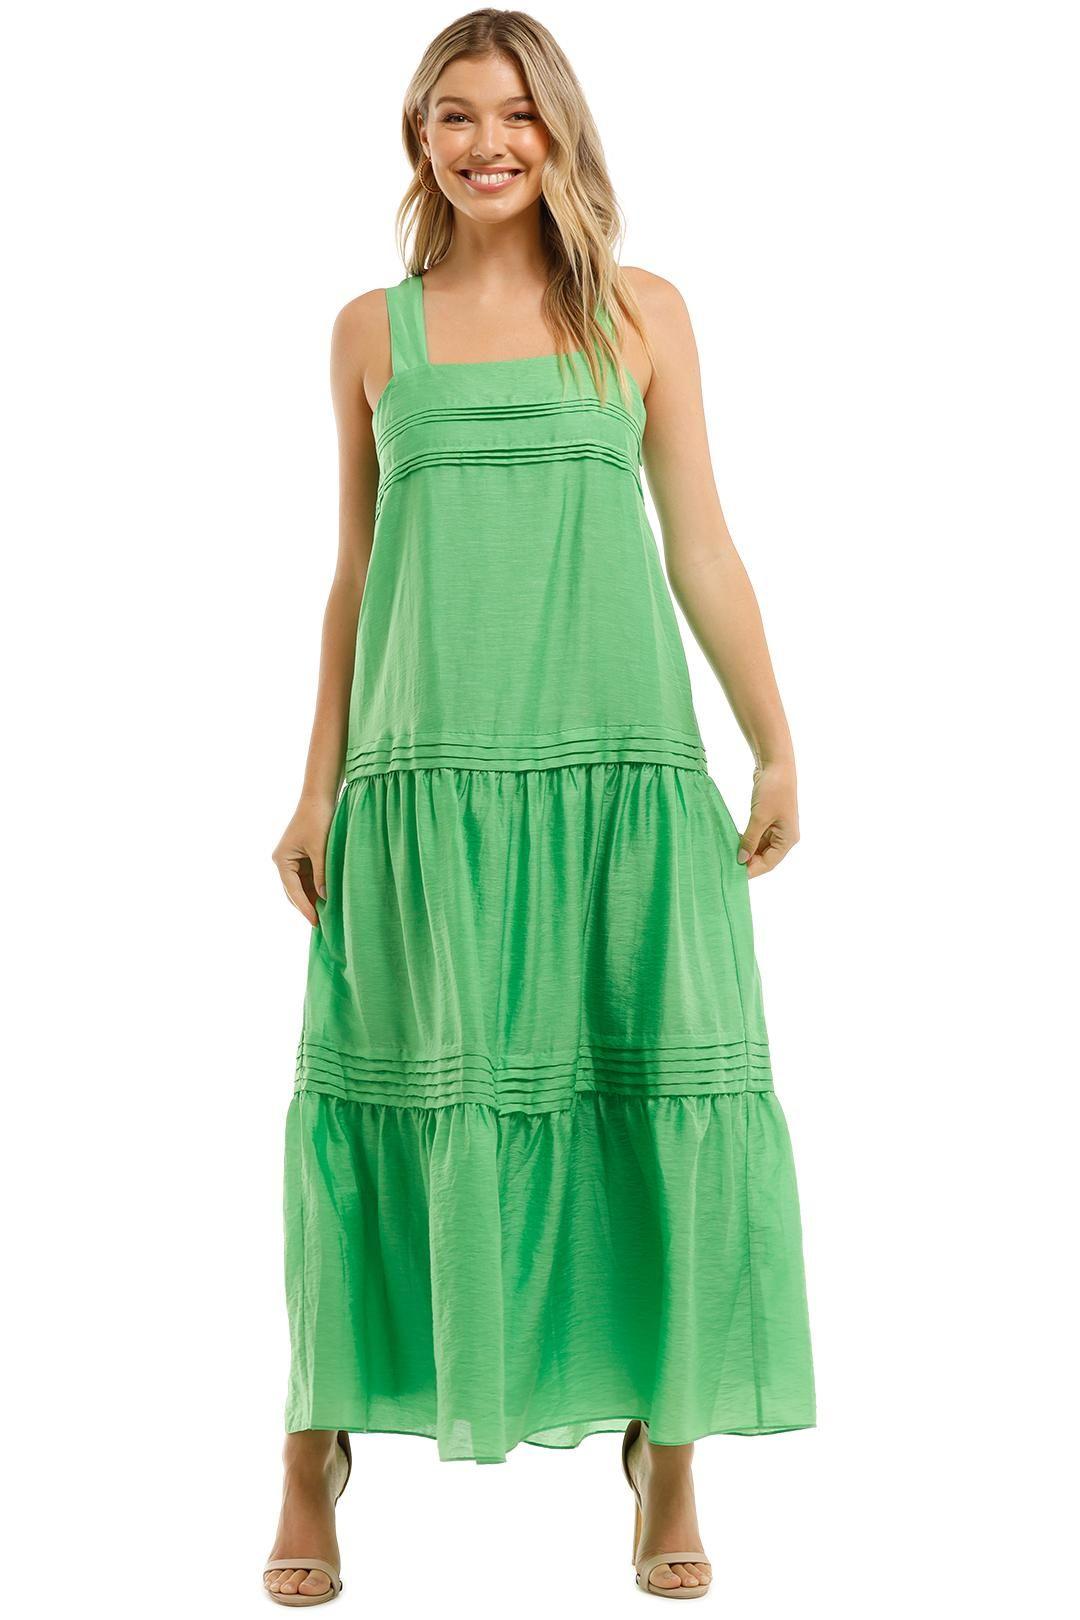 witchery Pintuck Tiered Maxi Dress Green